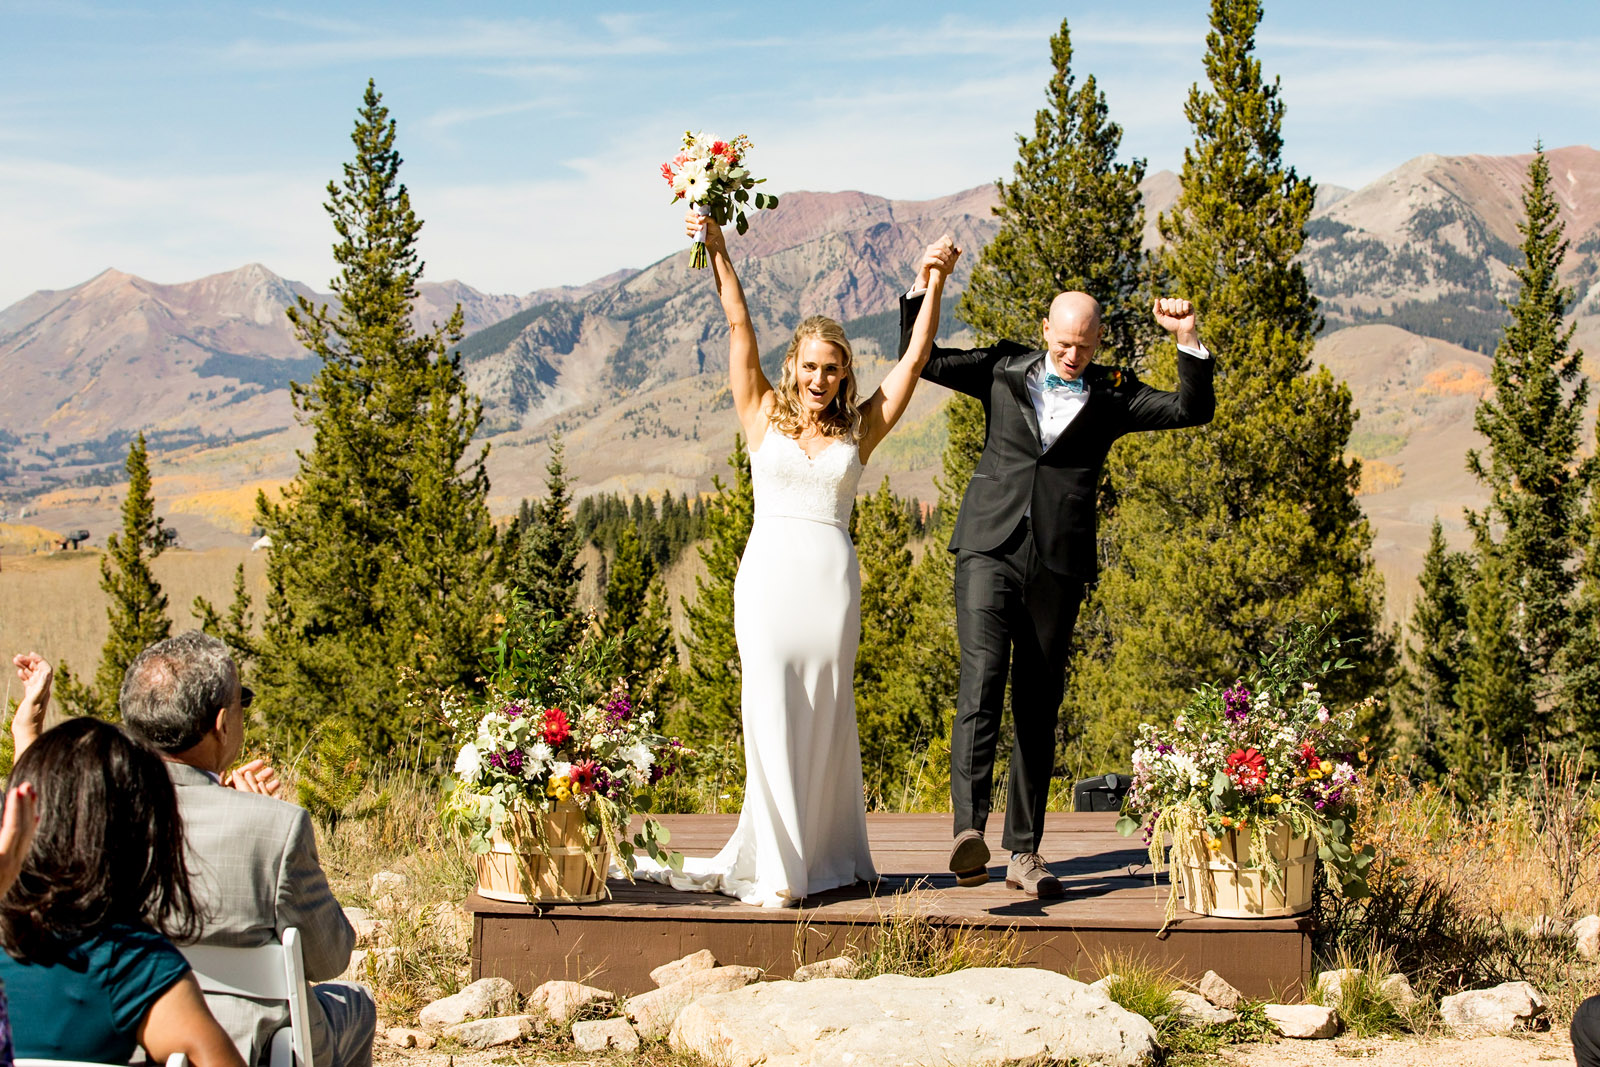 Crested Butte Wedding | Colorado Mountain Wedding by Sara Kauss Photography